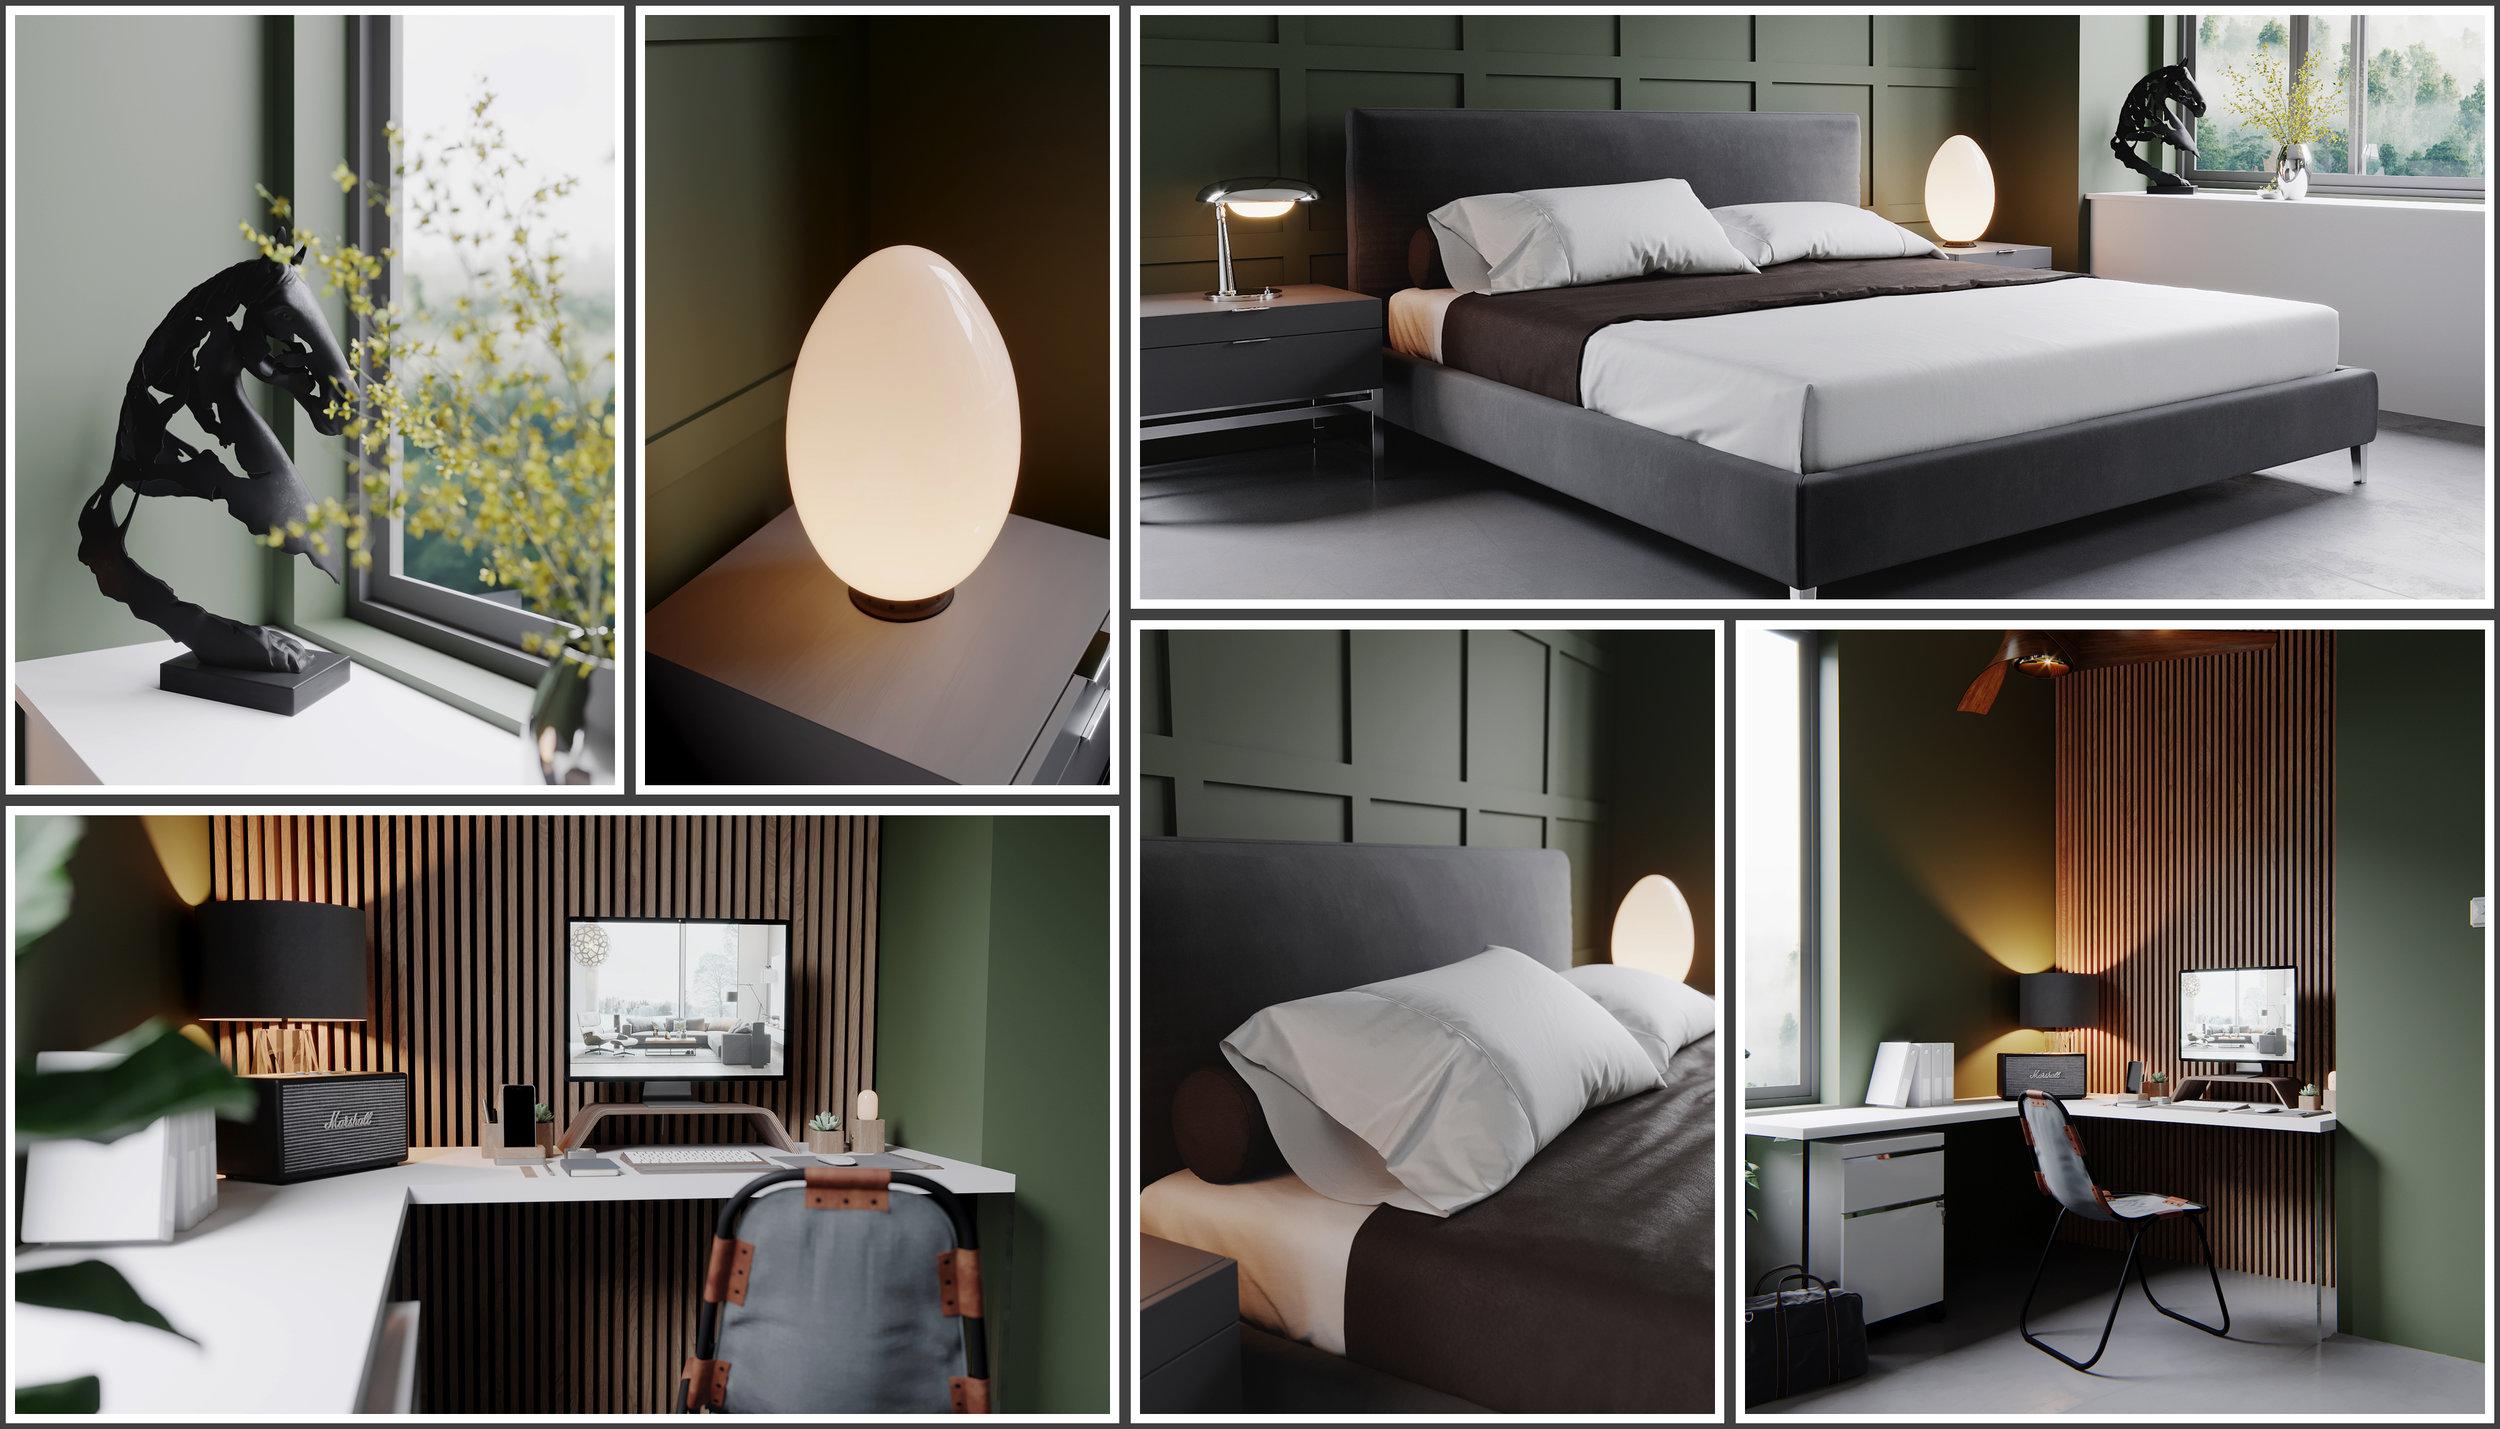 Midknight Green Collage.jpg